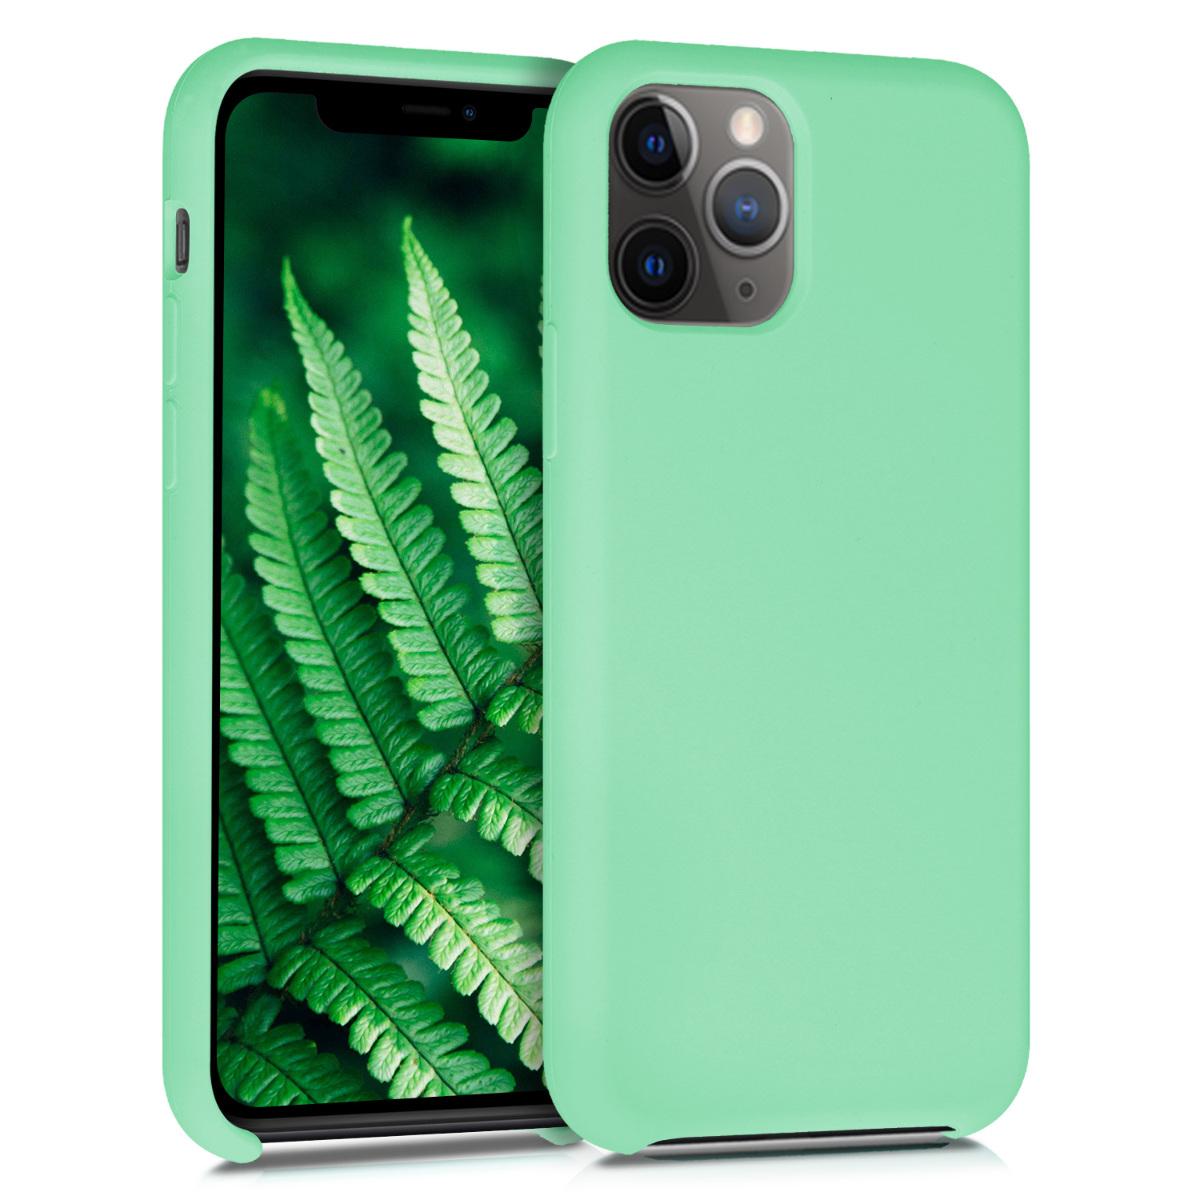 KW Θήκη Σιλικόνης iPhone 11 Pro Max - Soft Flexible Rubber - Peppermint Green (49725.147)